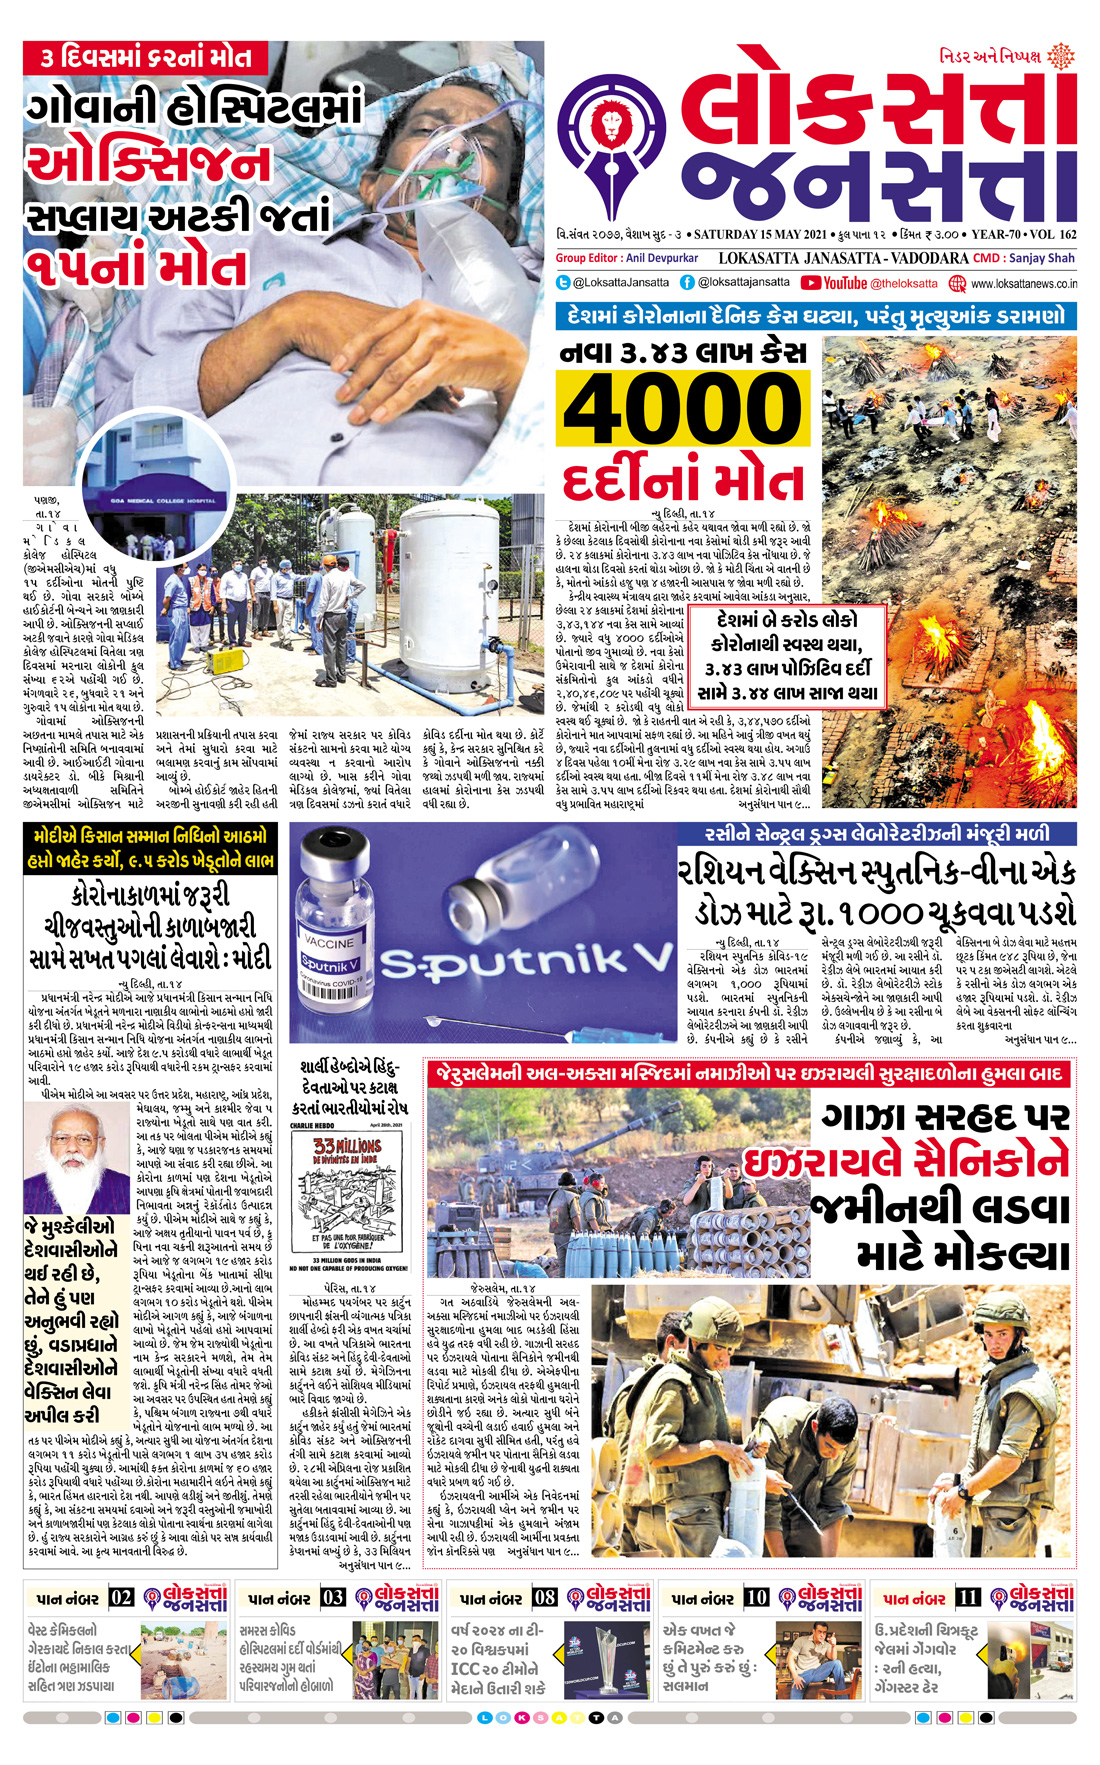 Loksatta Jansatta News Papaer E-paper dated 2021-05-15 | Page 1